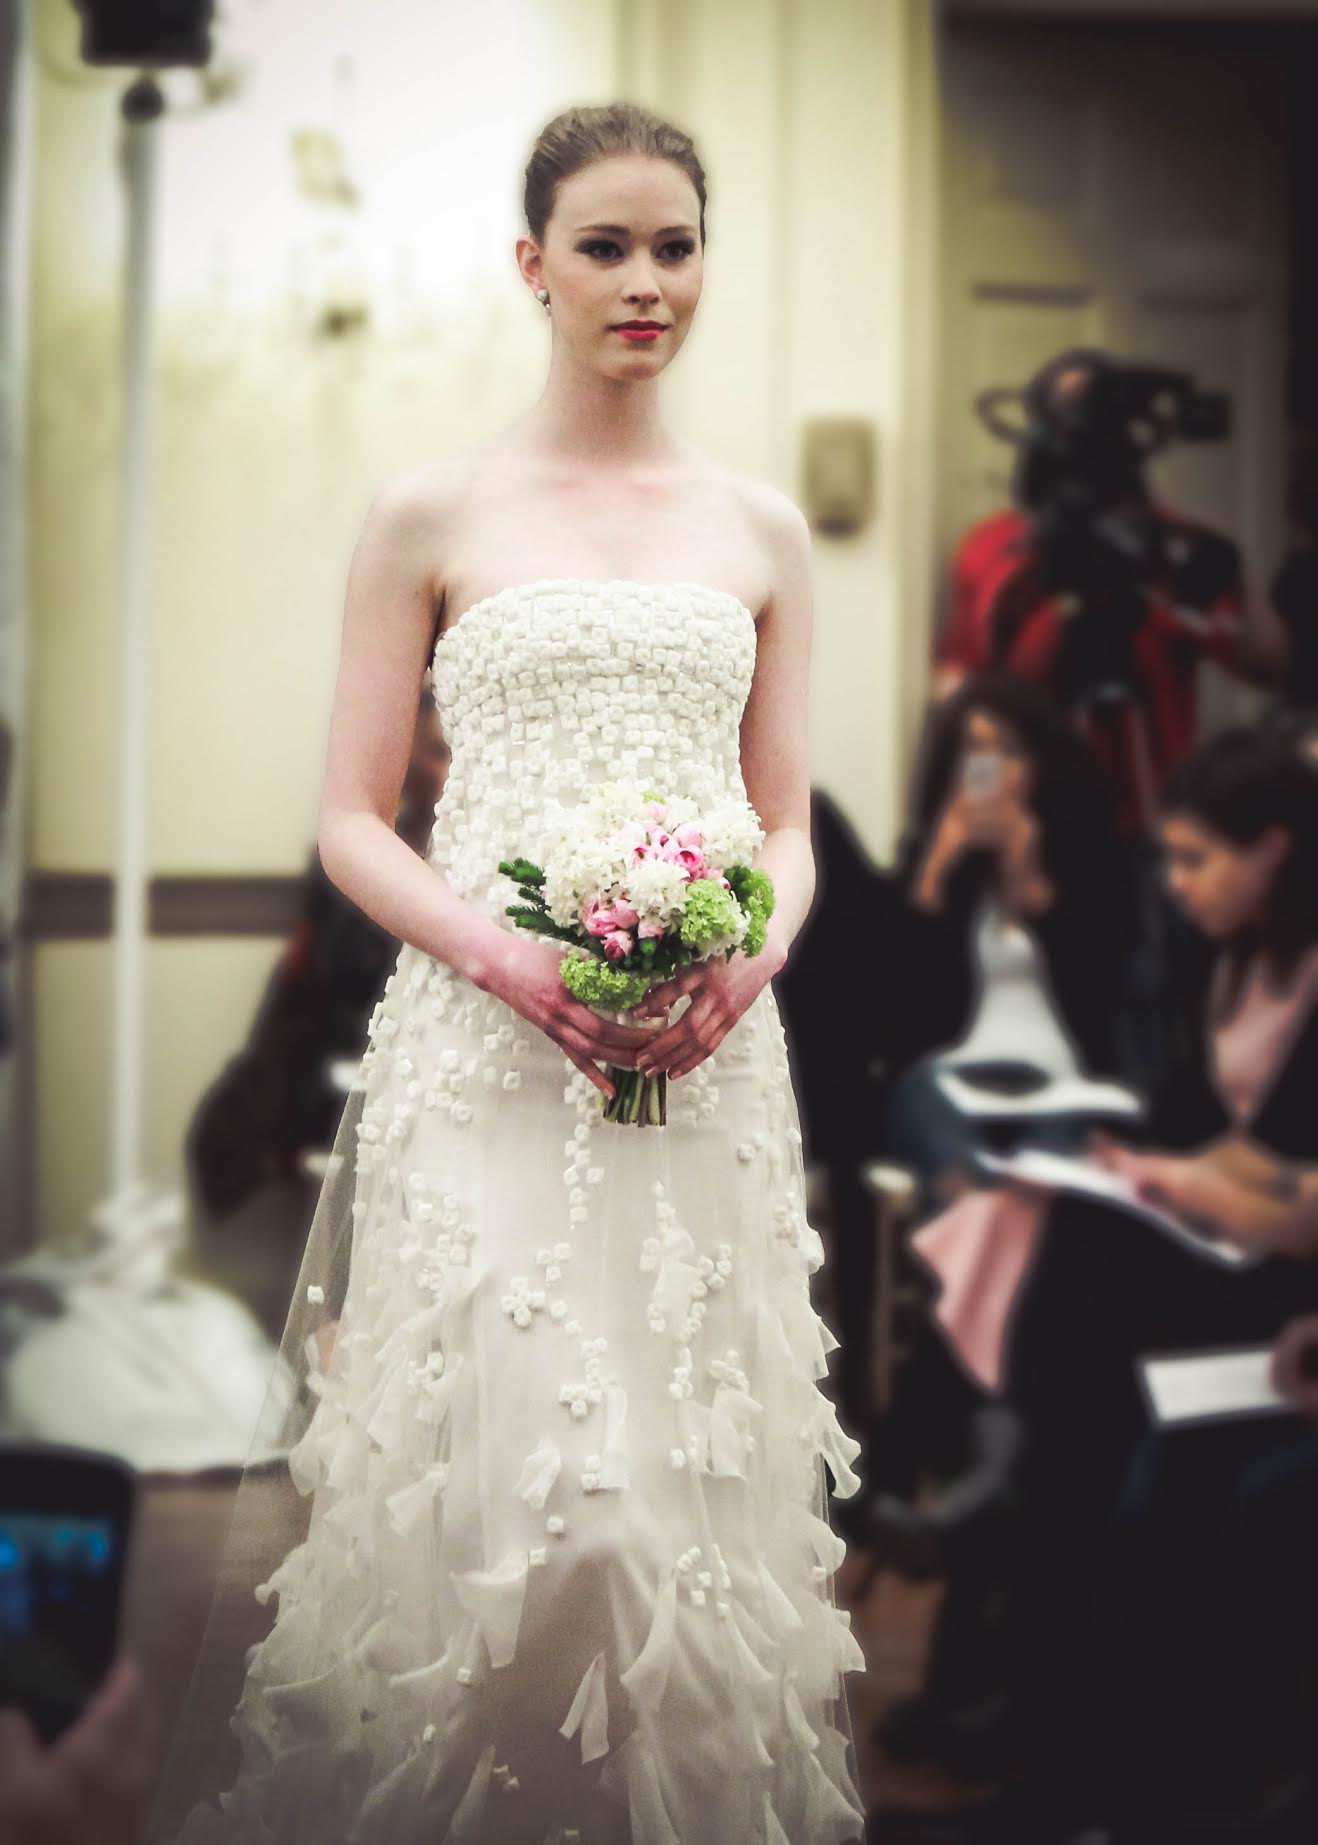 wedding+gown+ny+portraits+upper+eastside.jpg